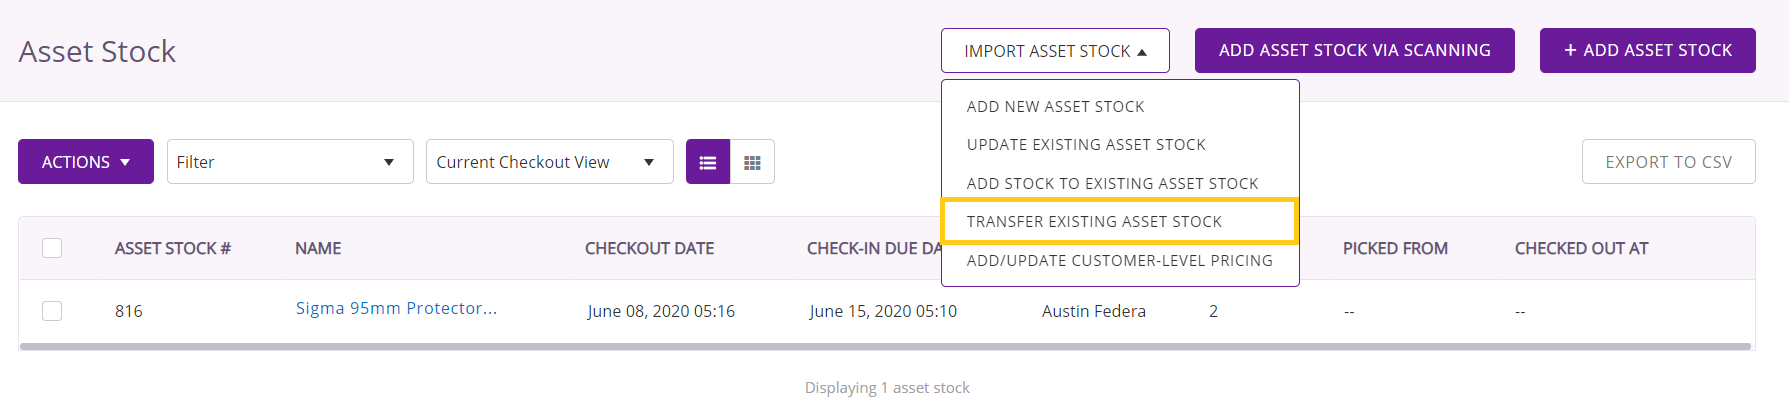 Transfer existing asset stock